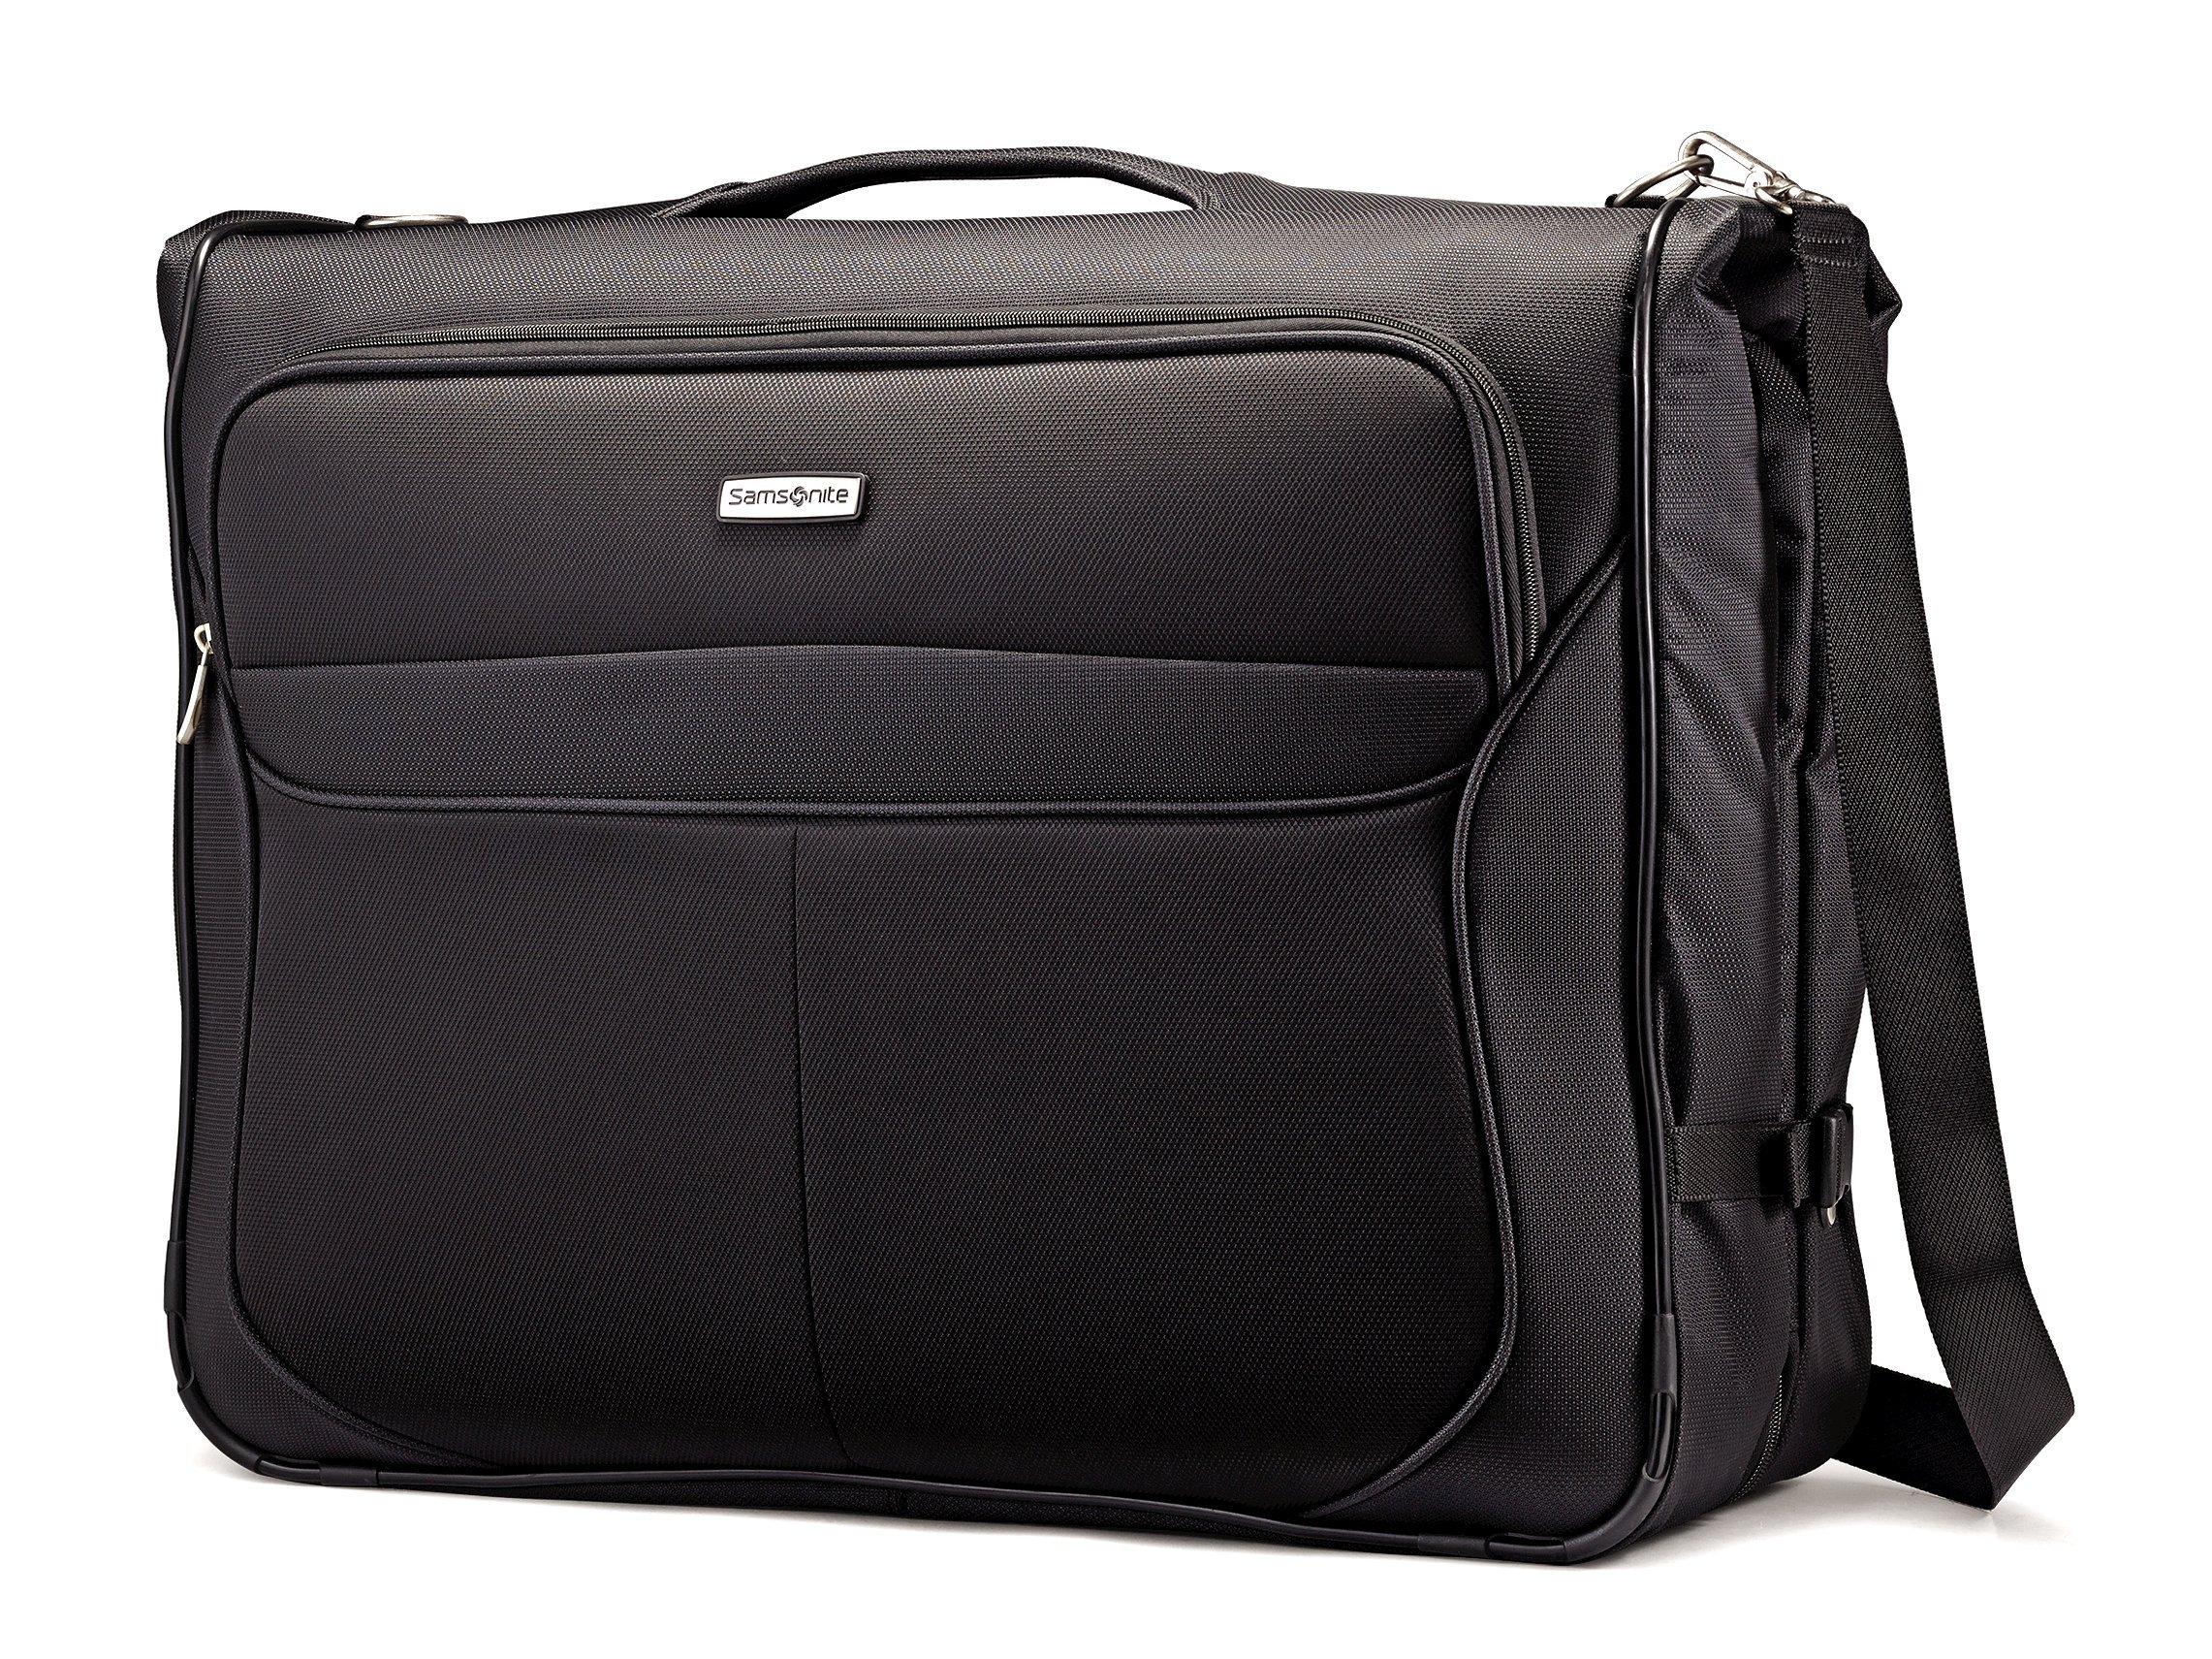 Samsonite Liftwo Ultra Valet Garment Bag, Black, One Size